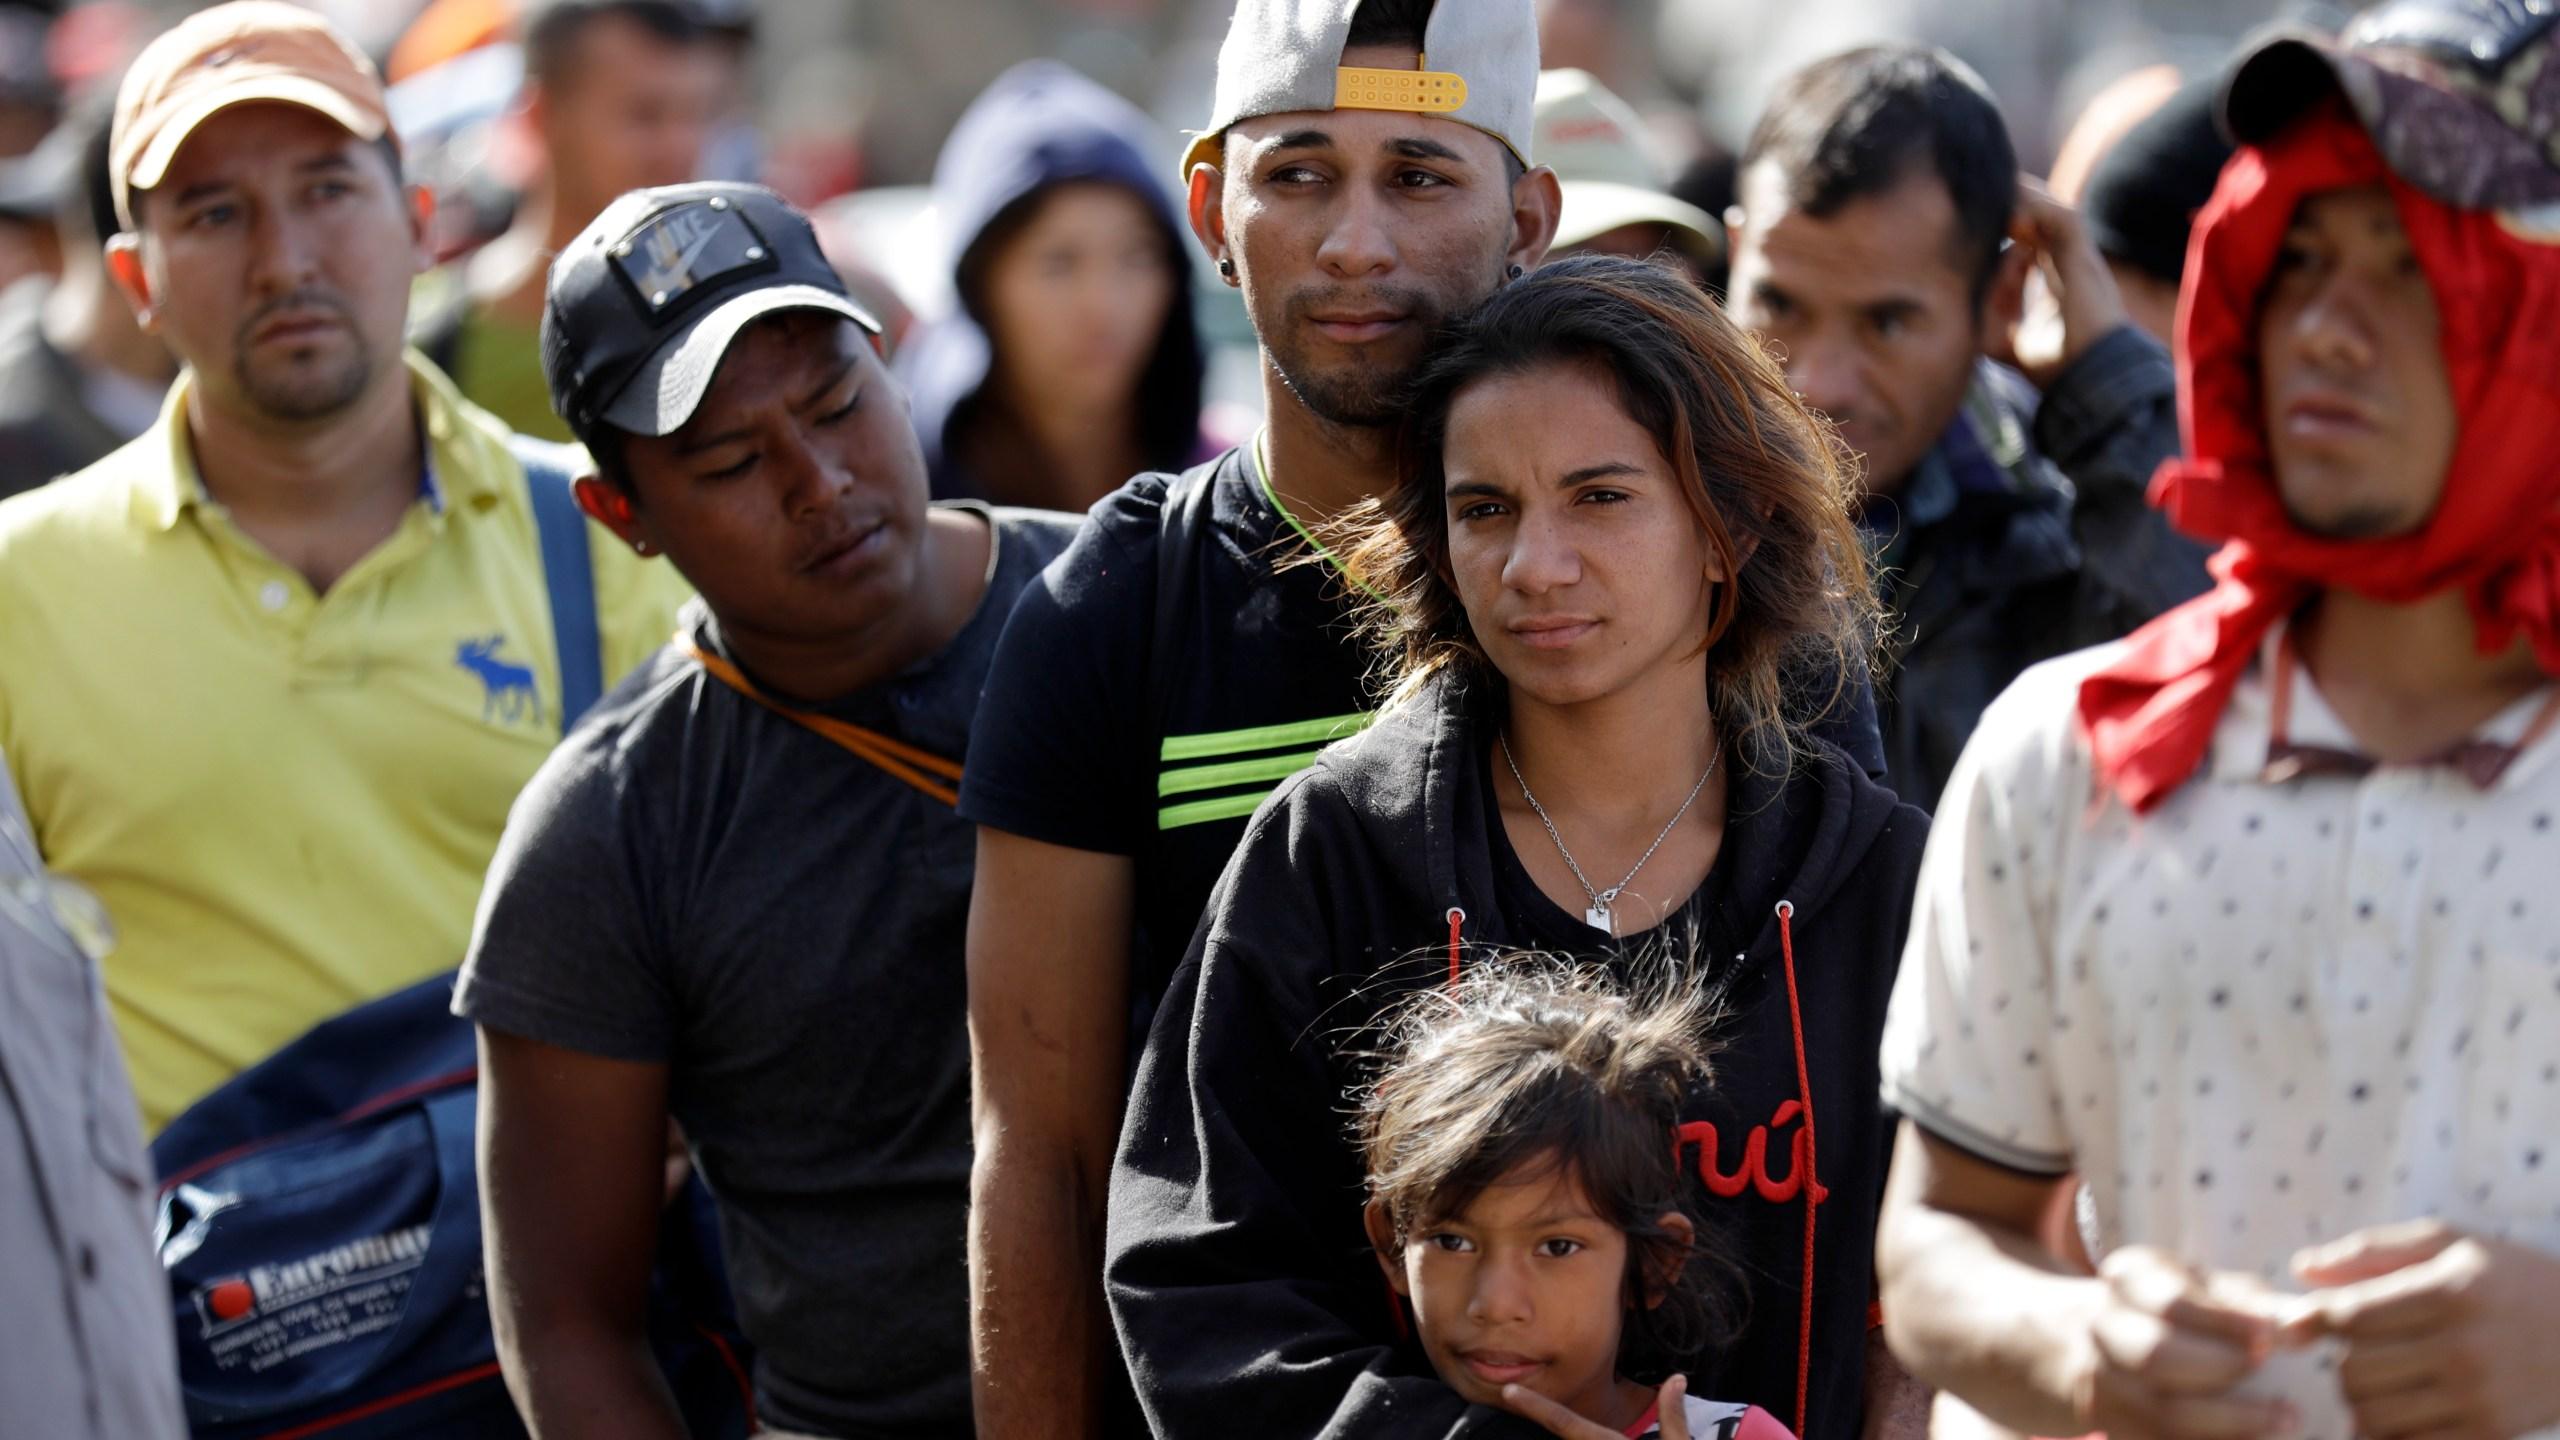 Central_America_Migrant_Caravan_00493-159532.jpg56760889